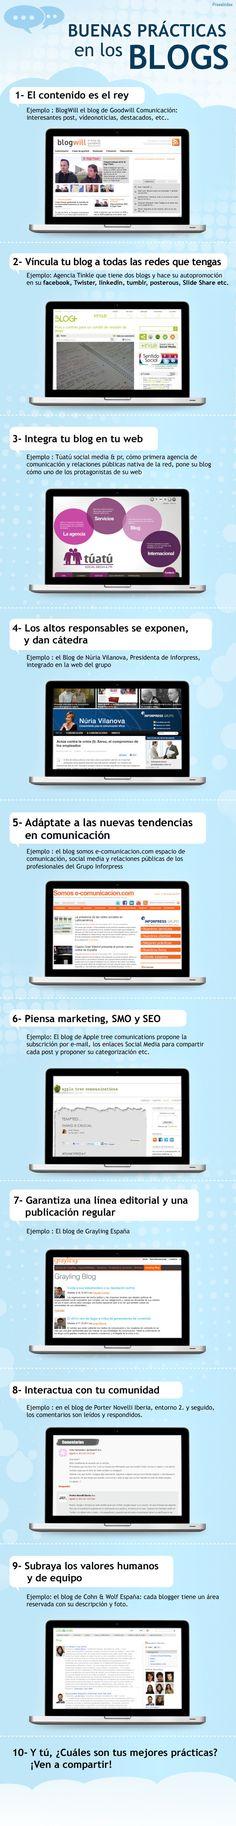 9 buenas prácticas para tu blog que debes saber. Infografía en español. #CommunityManager #RedesSociales #MarketingOnline #InternetMarketing #Infografia #CapacitaciónOnline